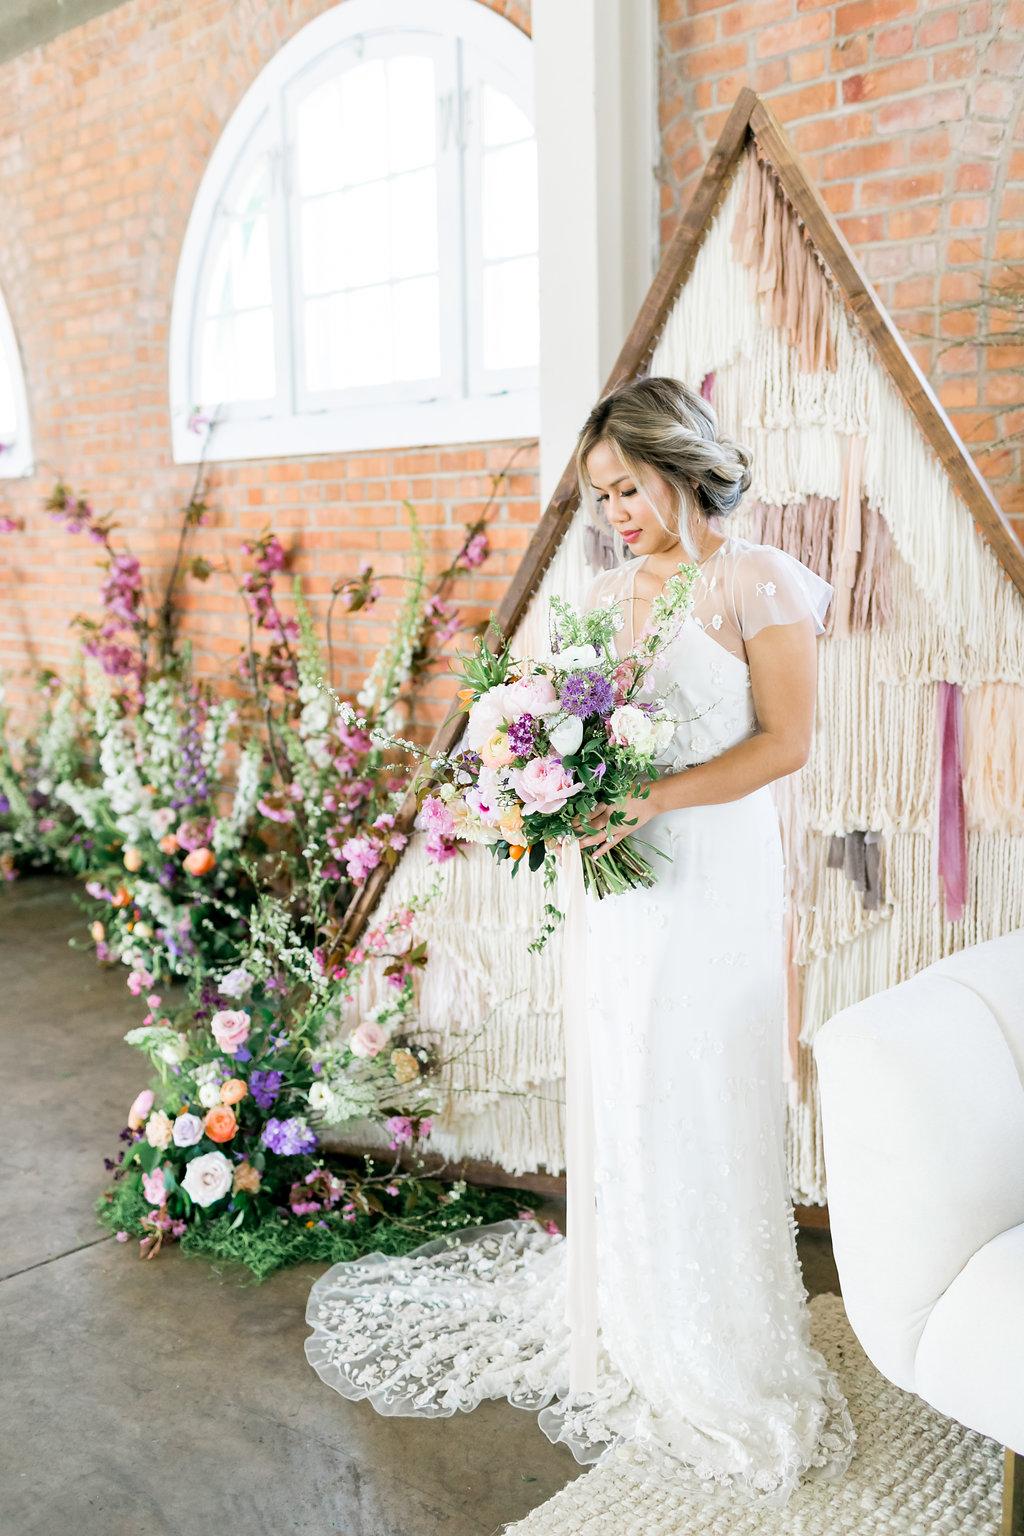 FloralBrickWeddingEditorial-NatalieSchuttPhotography-124 copy.JPG